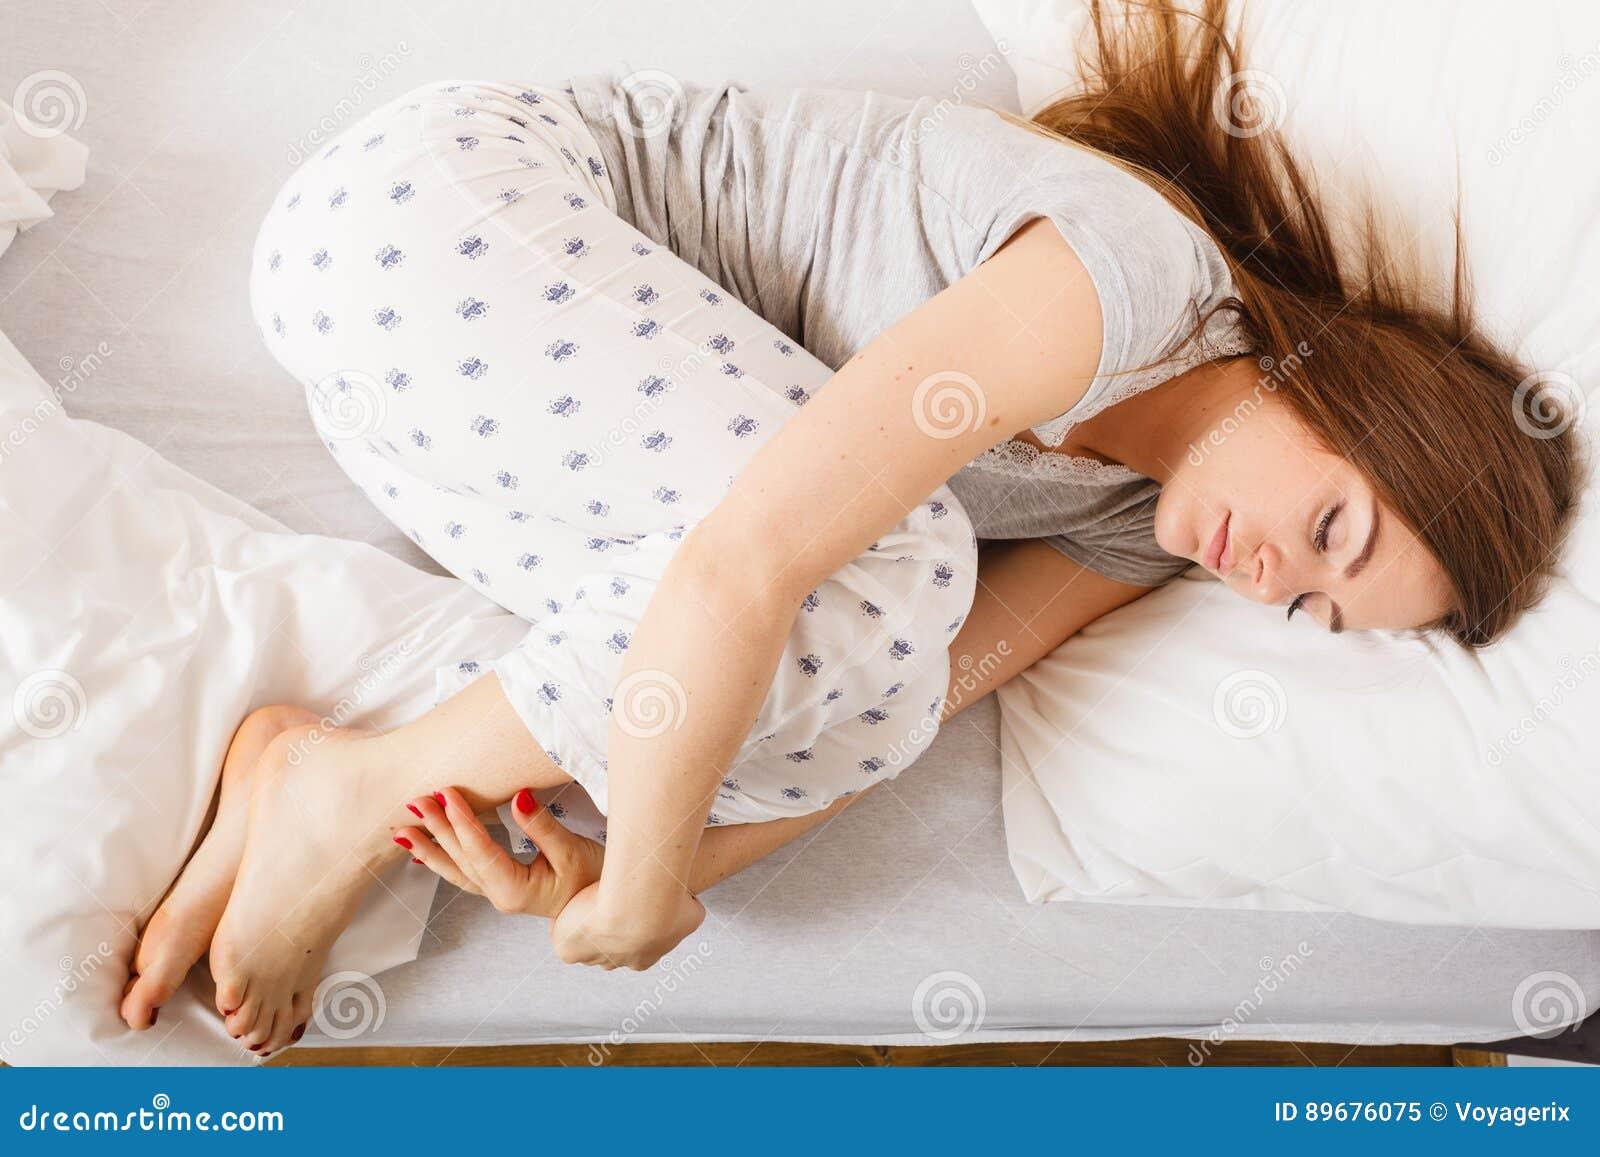 Tired Girl Sleeping Royalty Free Stock Photo